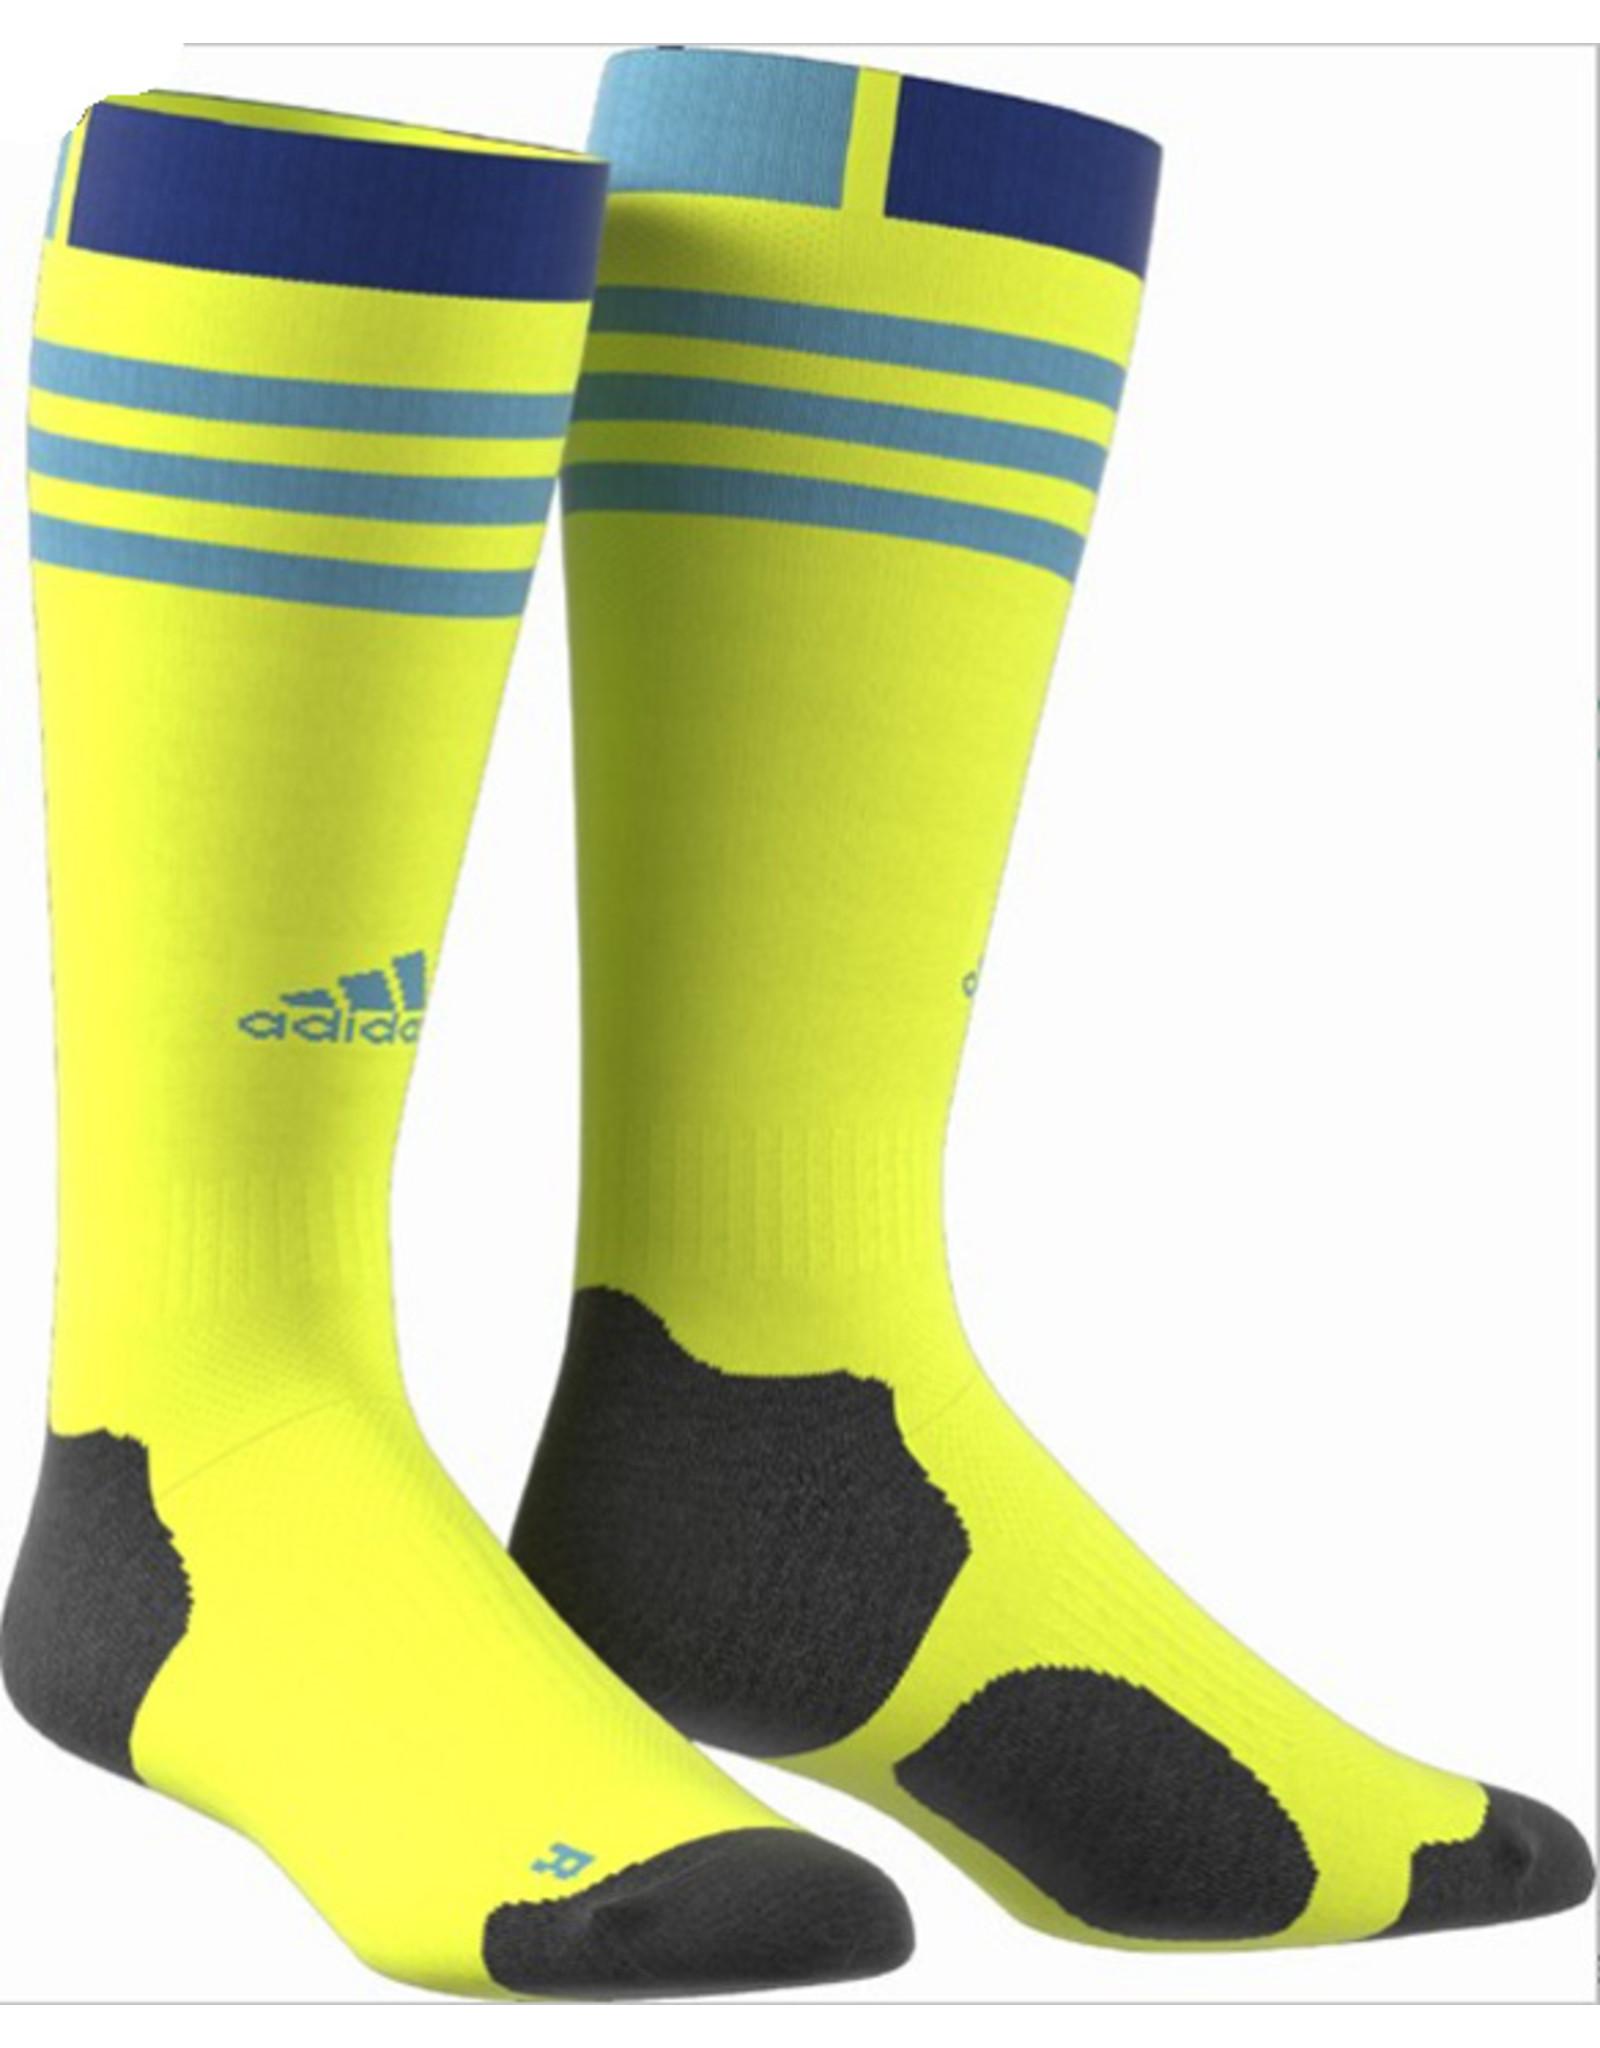 Adidas ID Sock Yellow